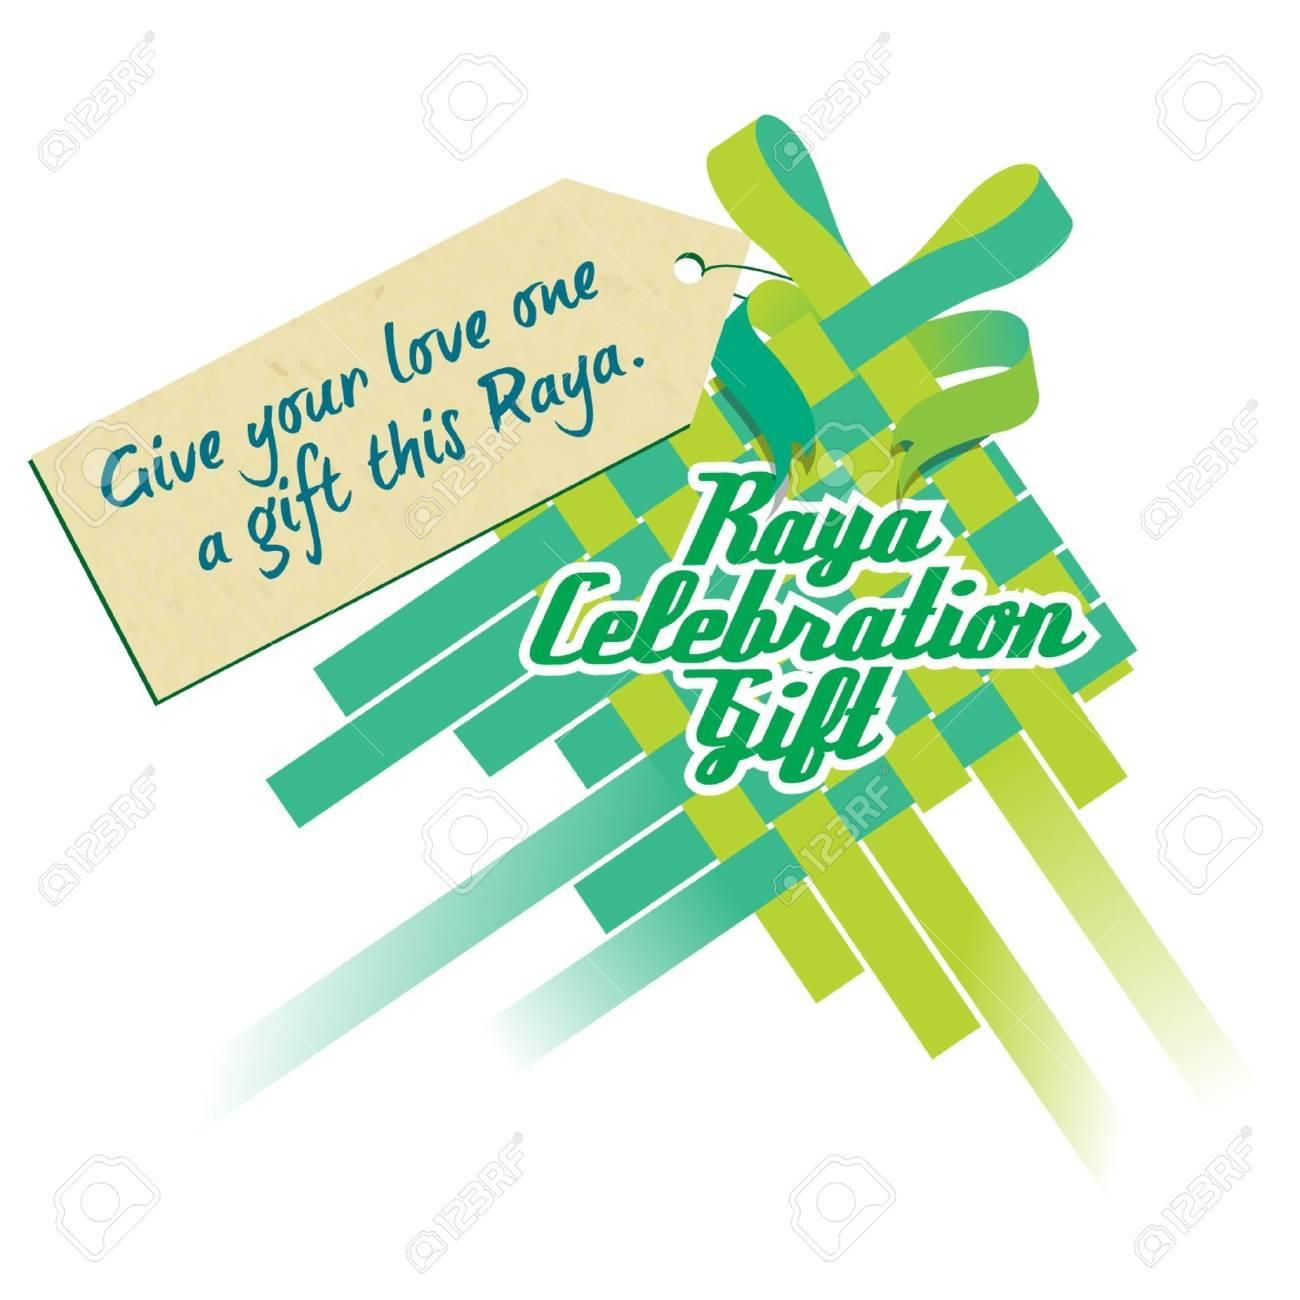 Raya Celebration Gift Stock Vector - 14799027